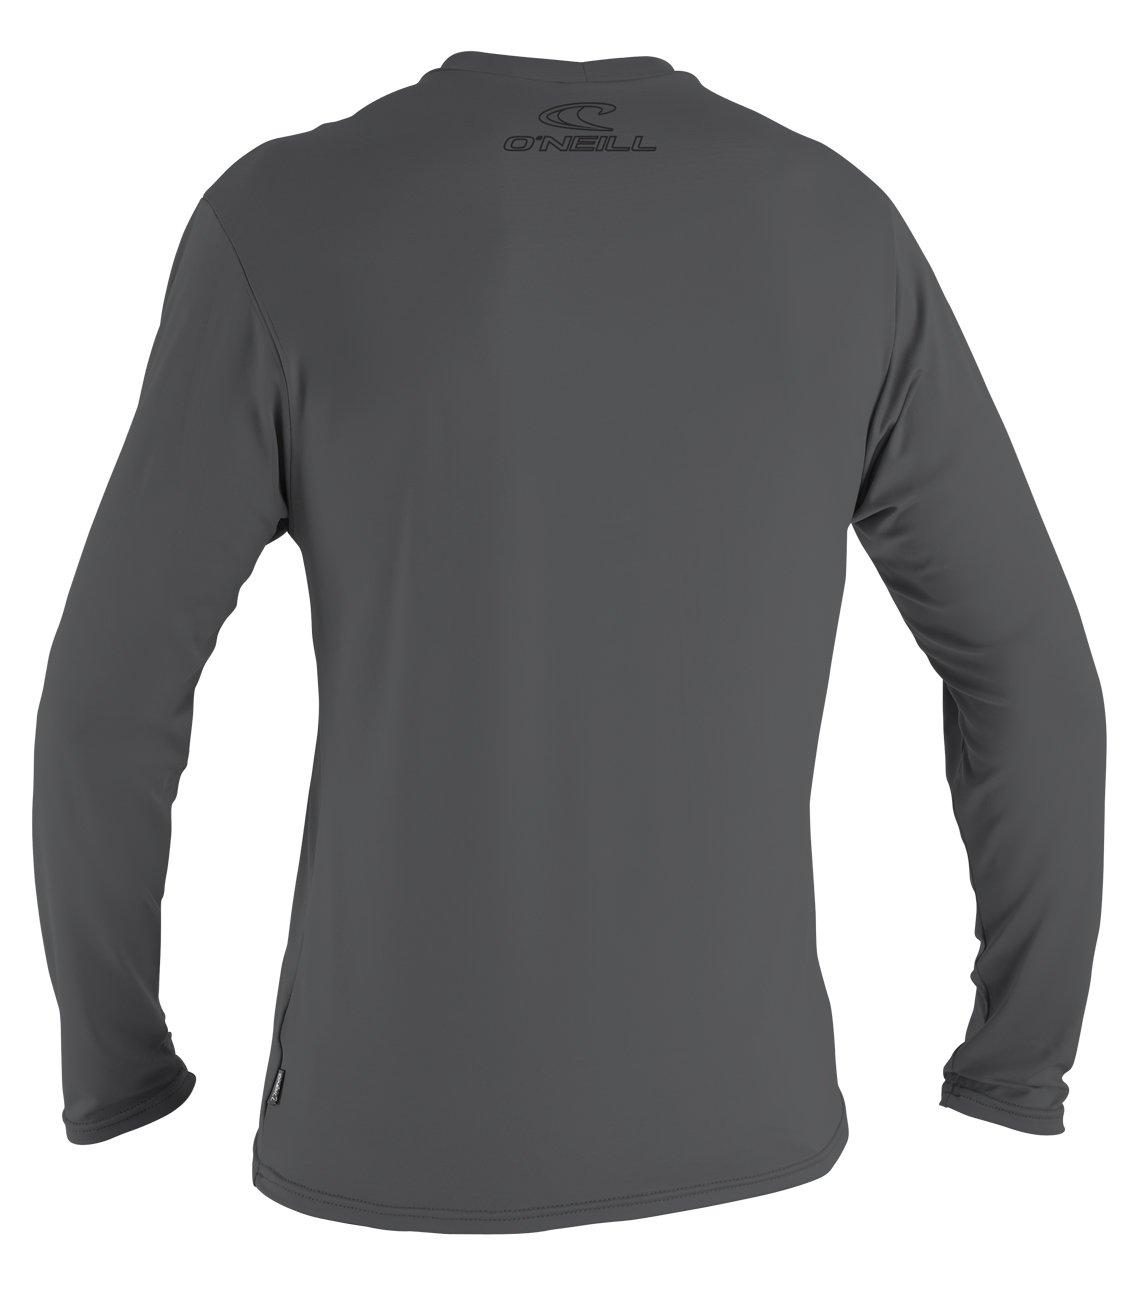 O'Neill Wetsuits Men's Basic Skins UPF 50+ Long Sleeve Sun Shirt, Smoke, Medium by O'Neill Wetsuits (Image #2)